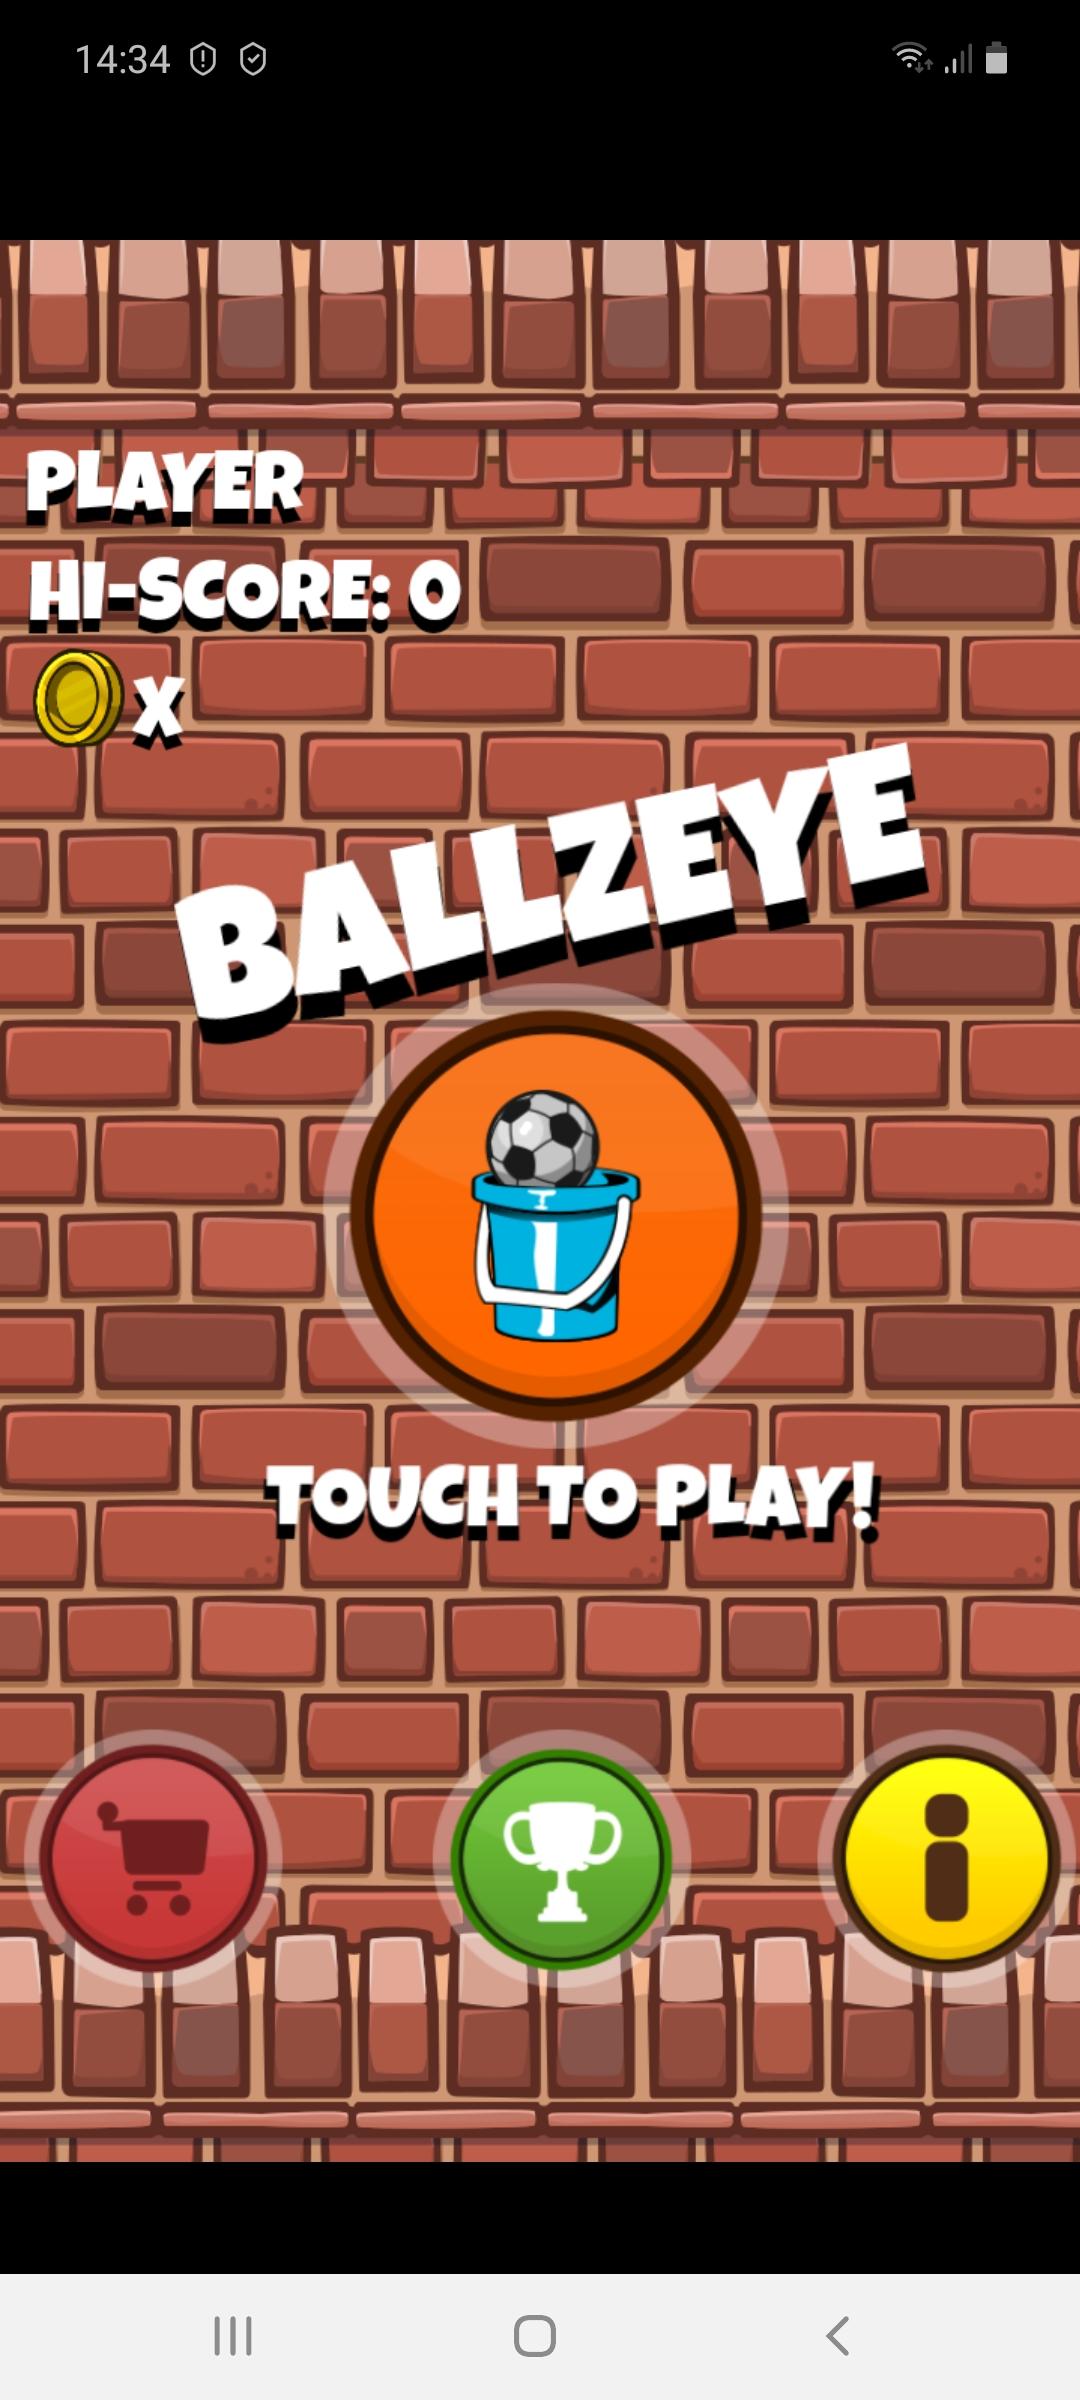 Ballzeye